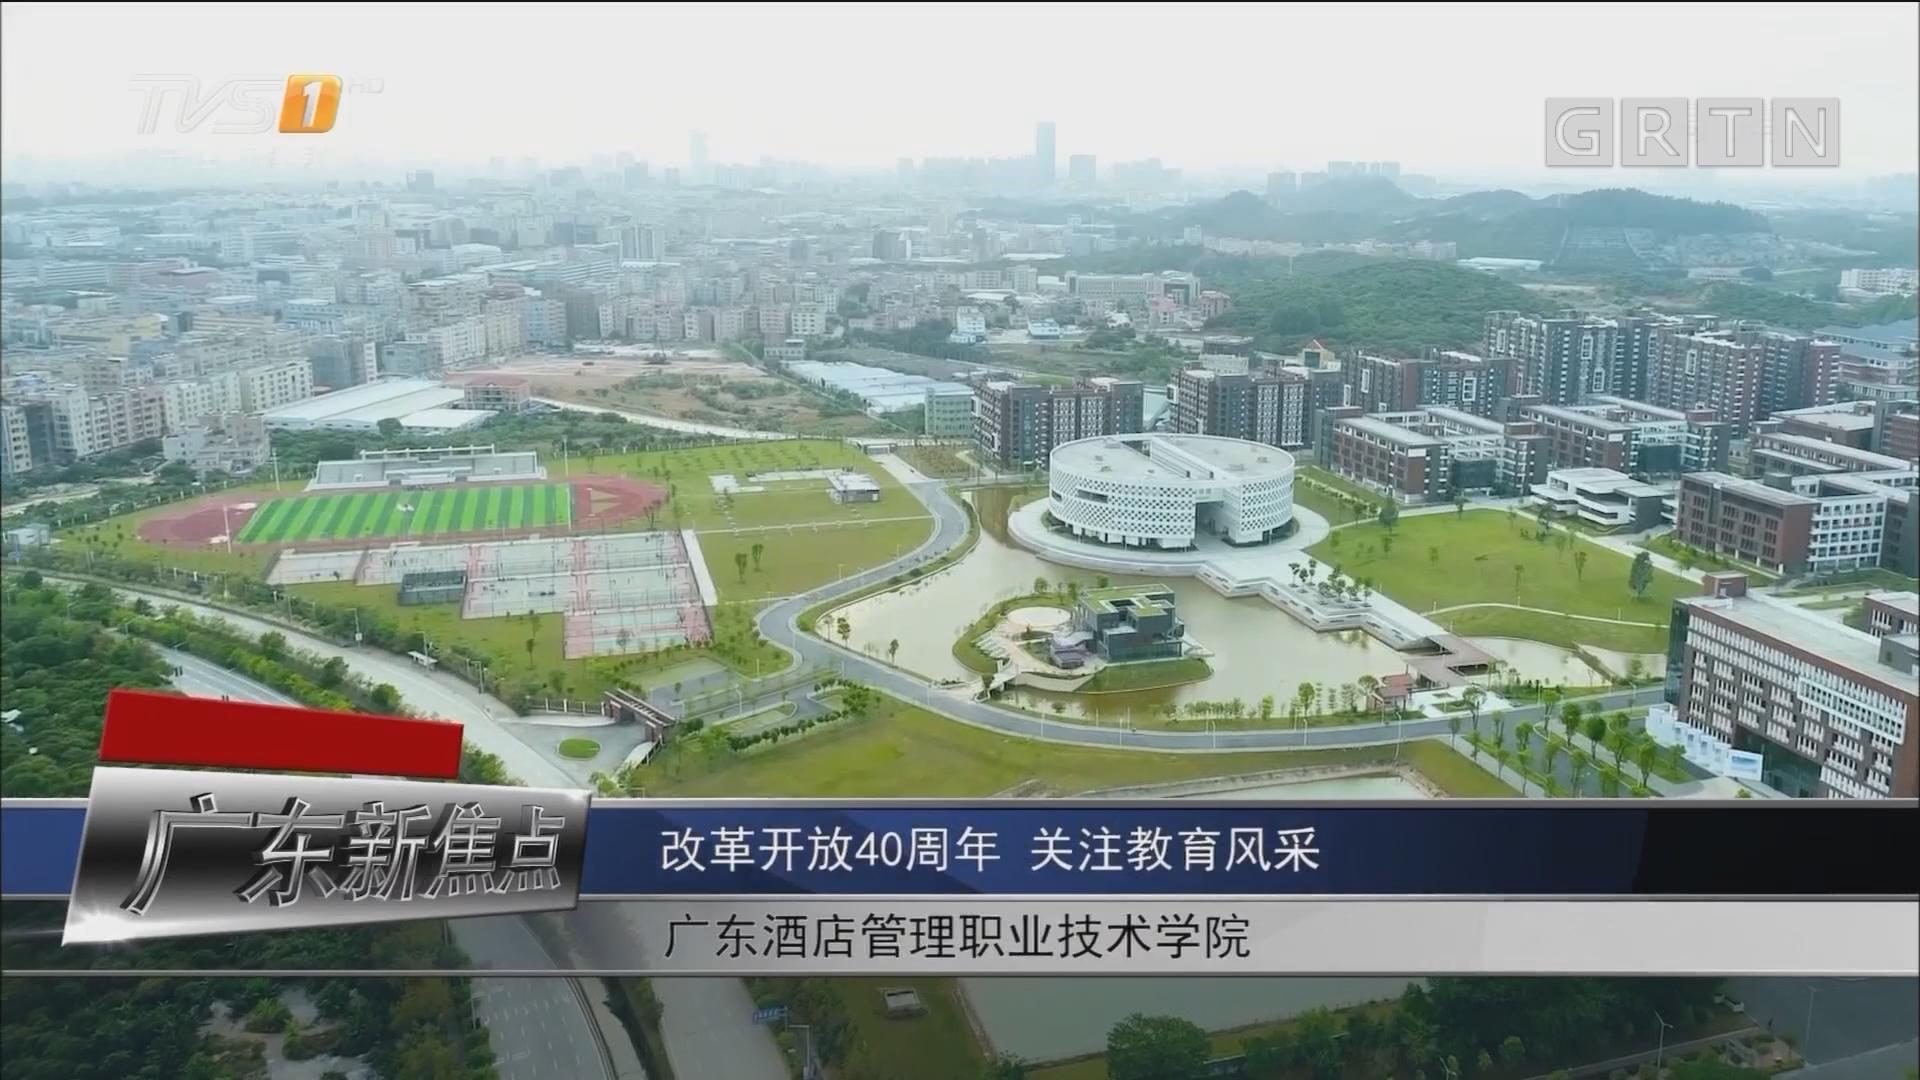 [HD][2019-03-16]广东新焦点:改革开放40周年 关注教育风采 广东酒店管理职业技术学院